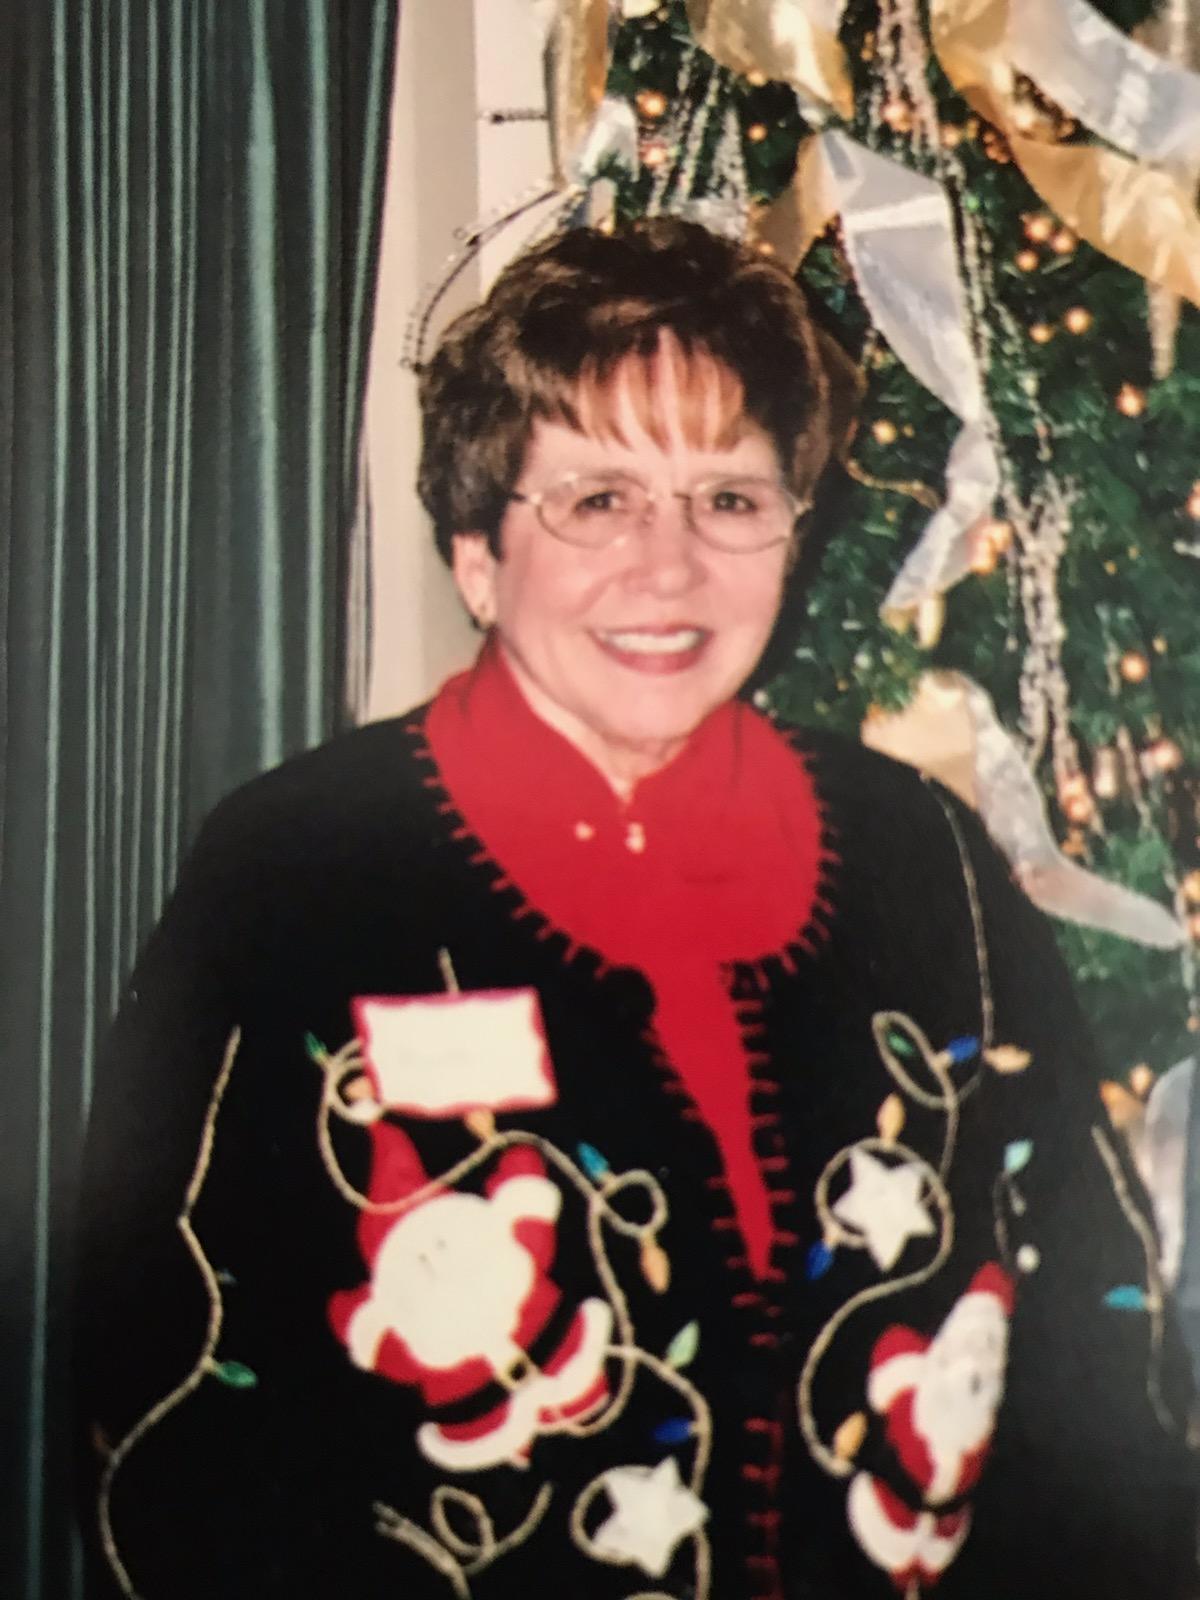 Mardee Korinek was the first executive director of the Omaha Bar Association. (Donna Birkby)